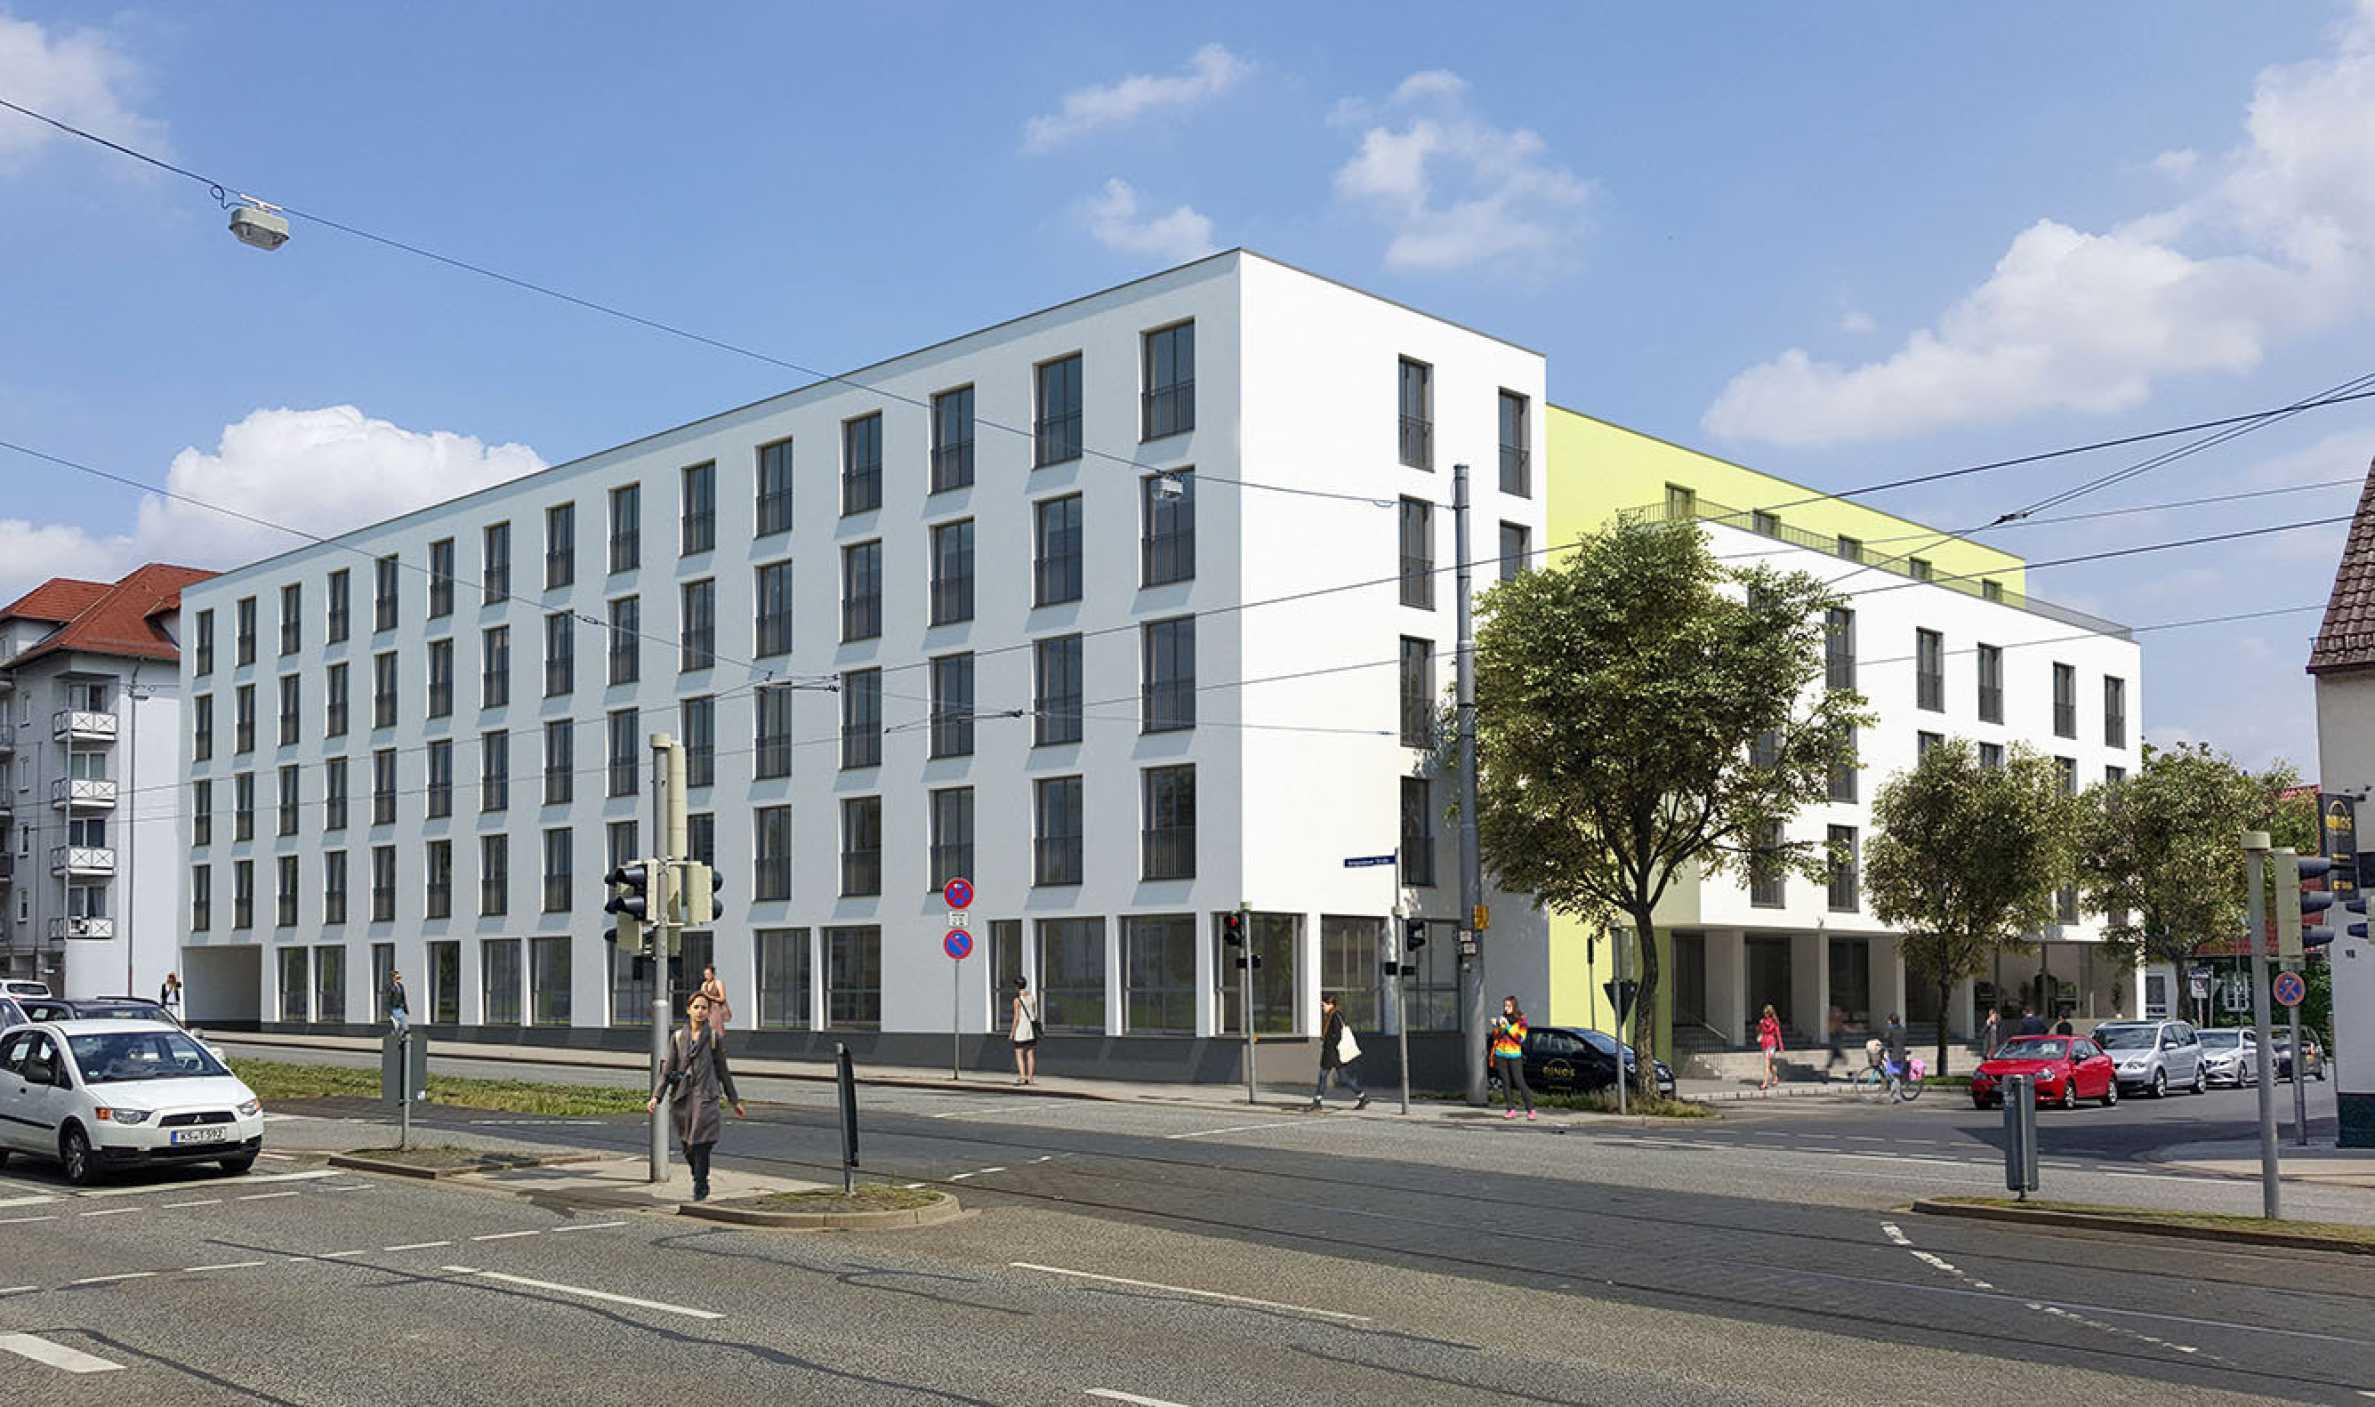 Student apartments near the University of Kassel1 - Stonehard